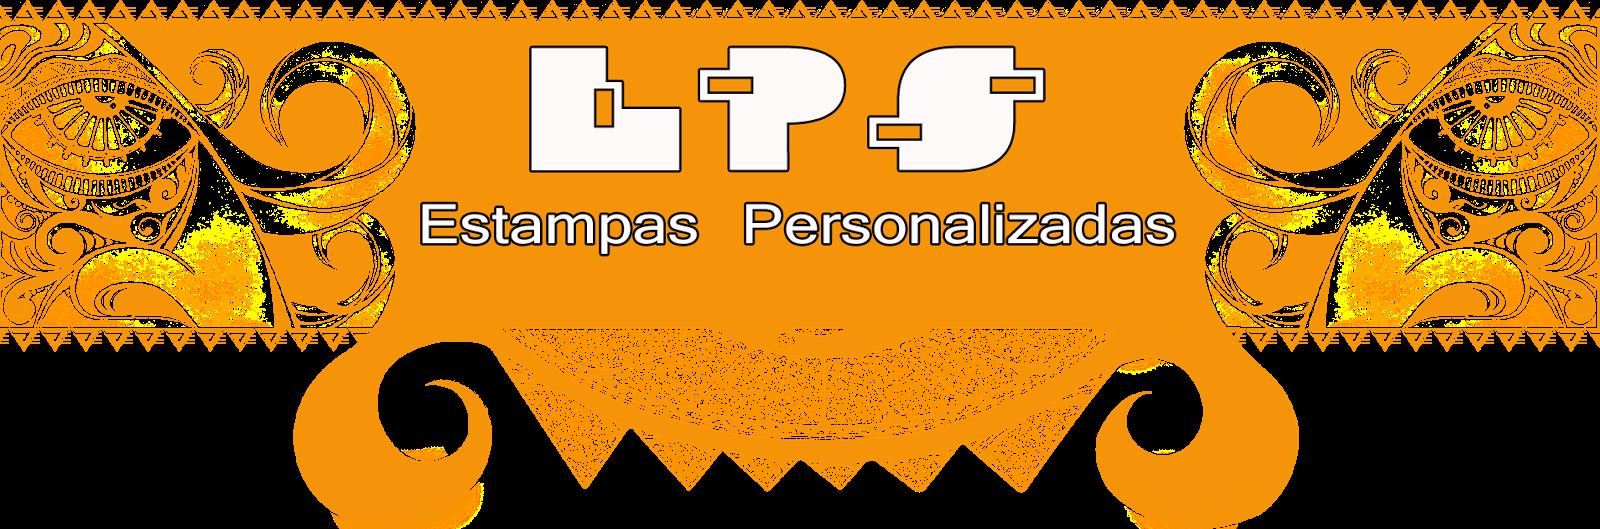 LPS Estampas